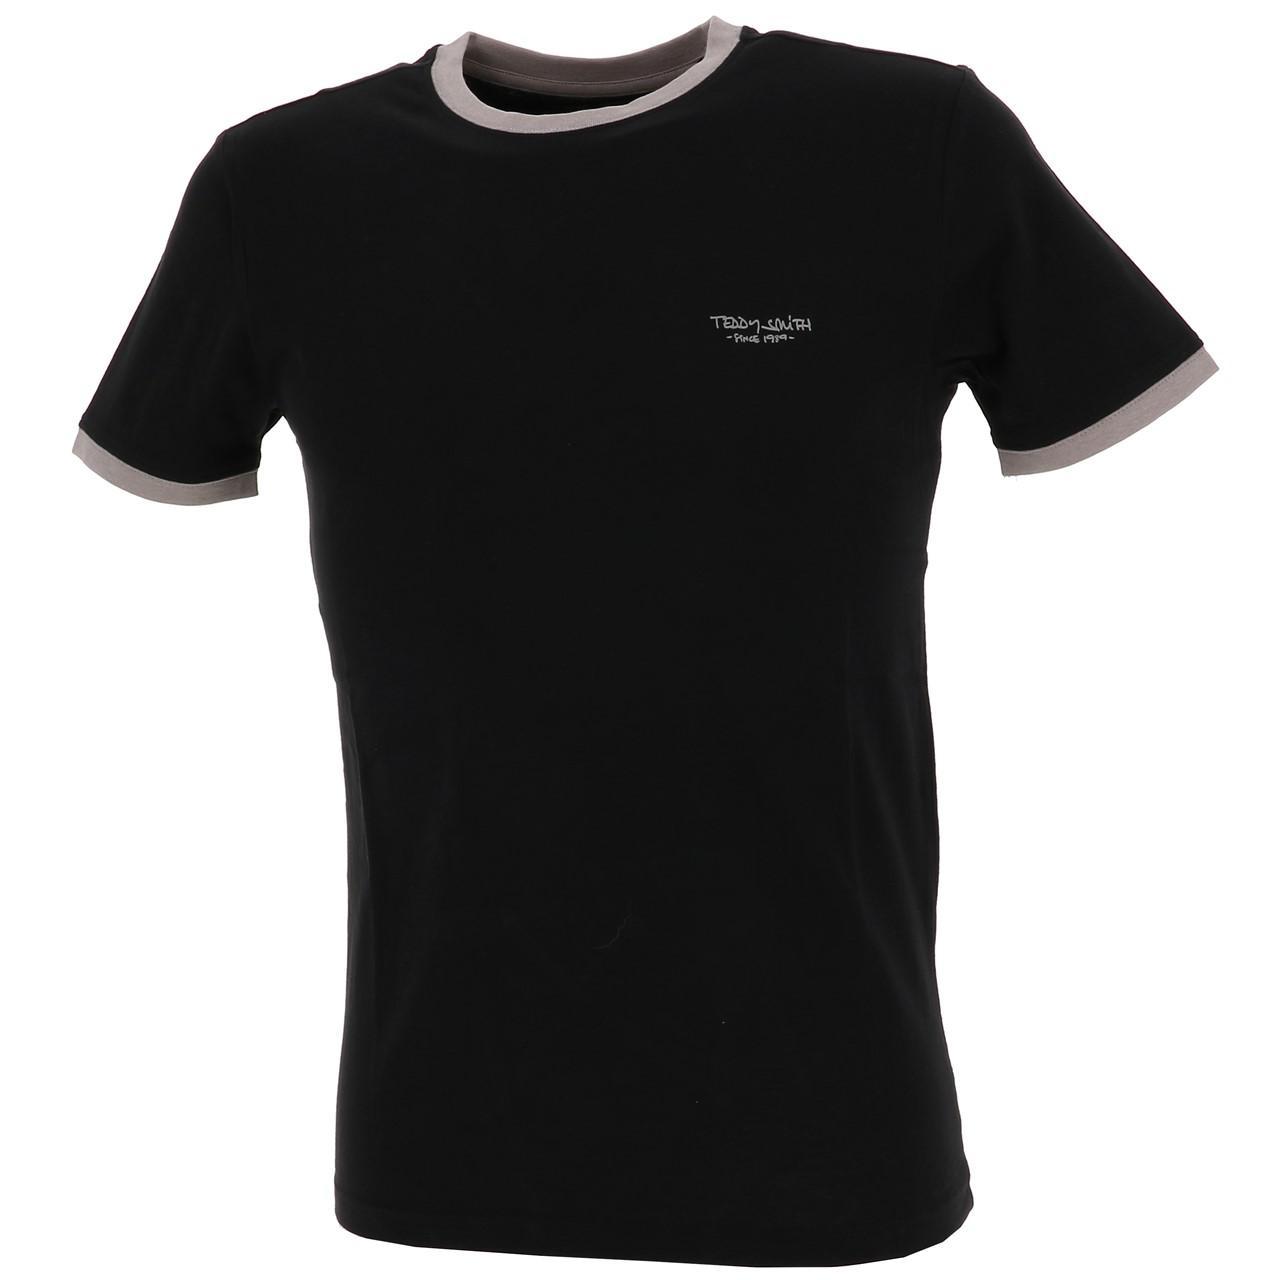 Short-Sleeve-T-Shirt-Teddy-Smith-the-Tee-Mc-Black-Black-65767-New